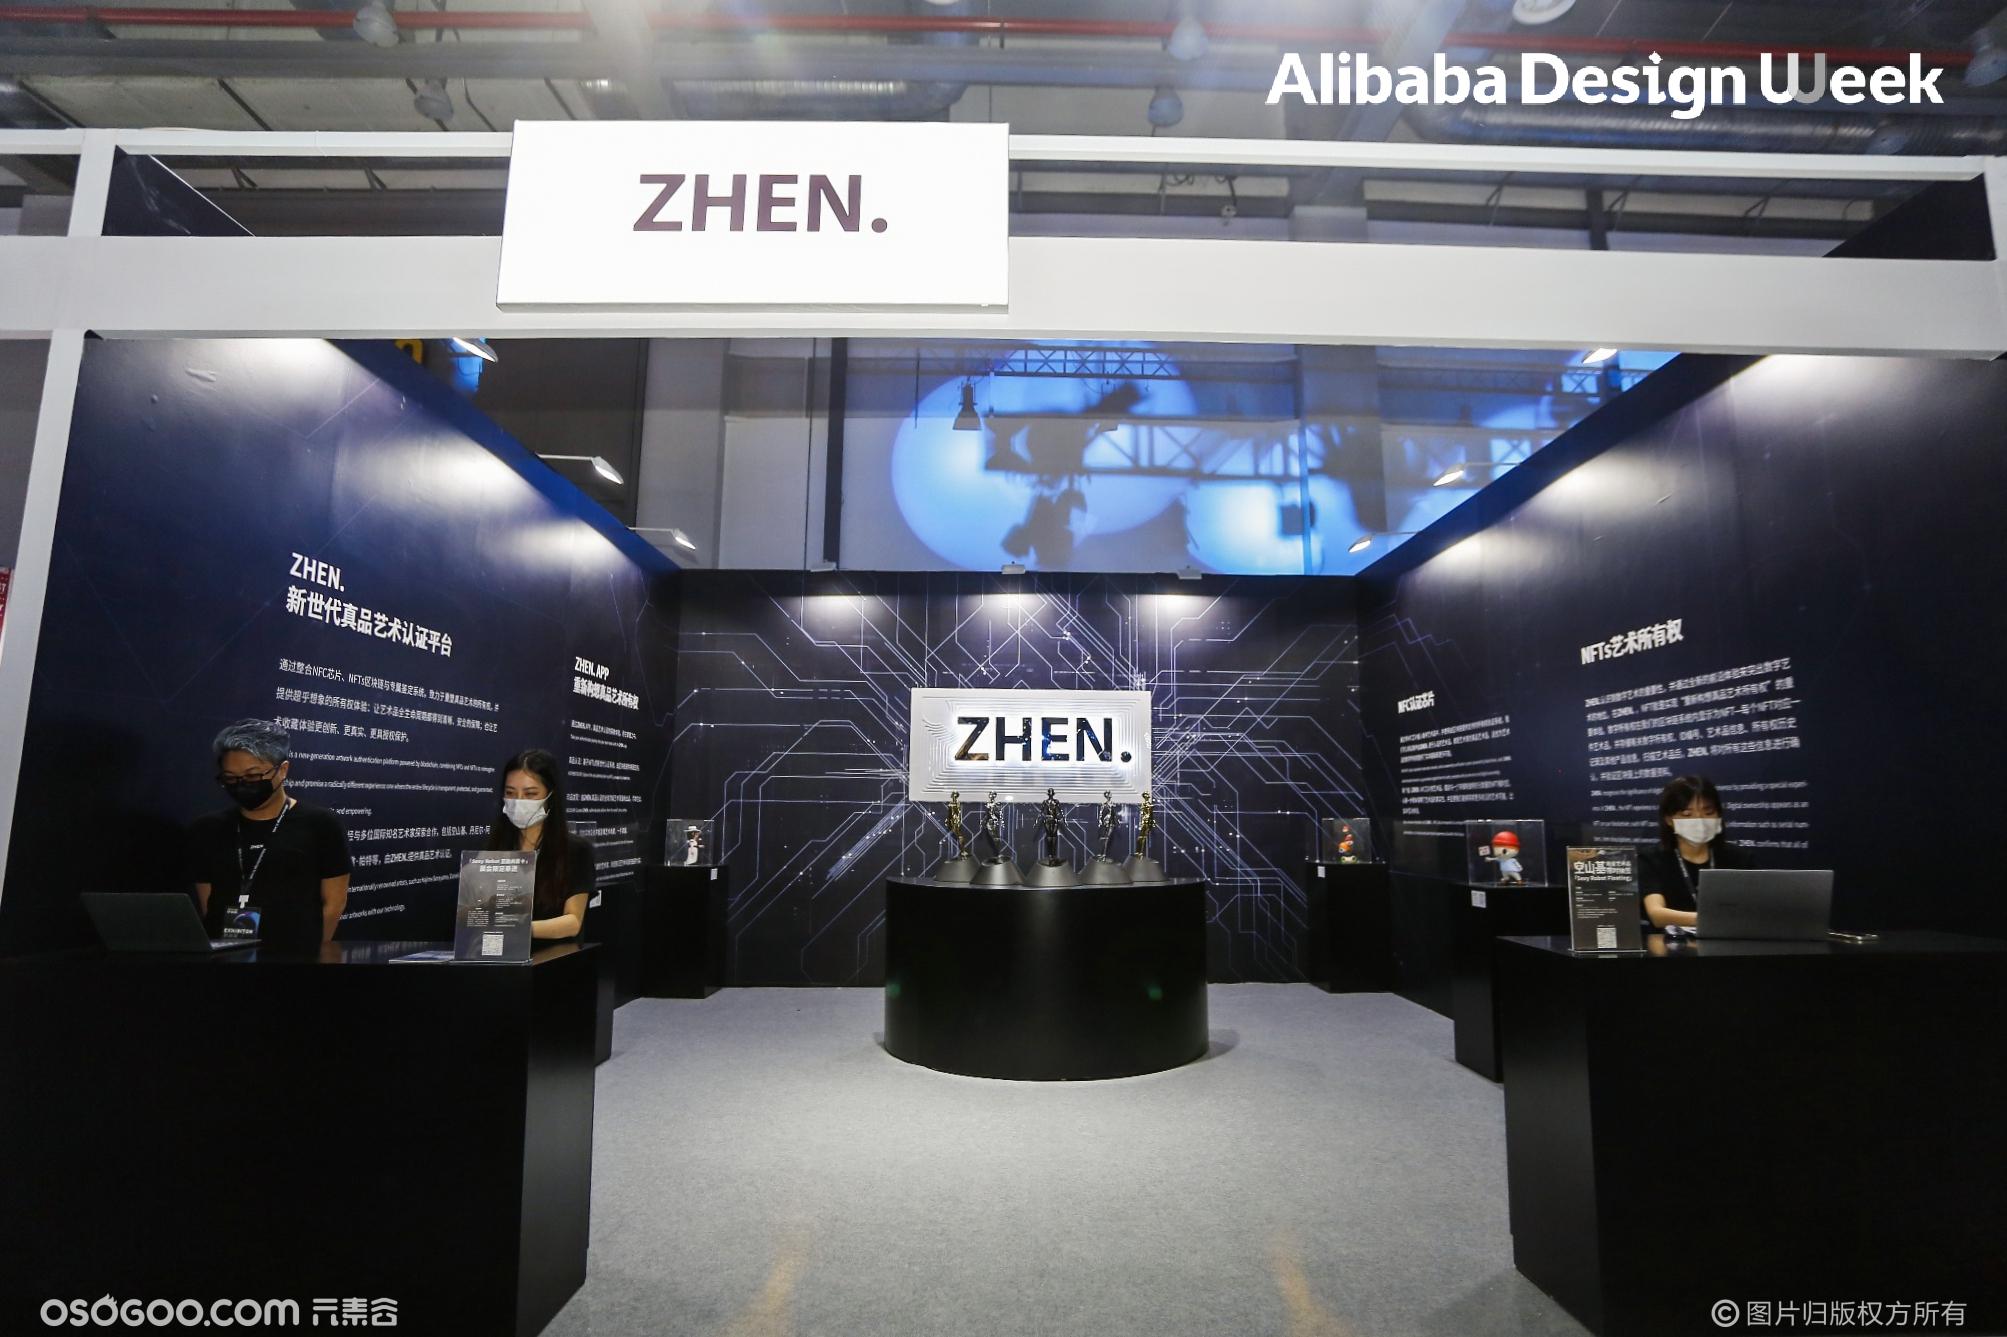 2021阿里巴巴设计周(Alibaba Design Wee